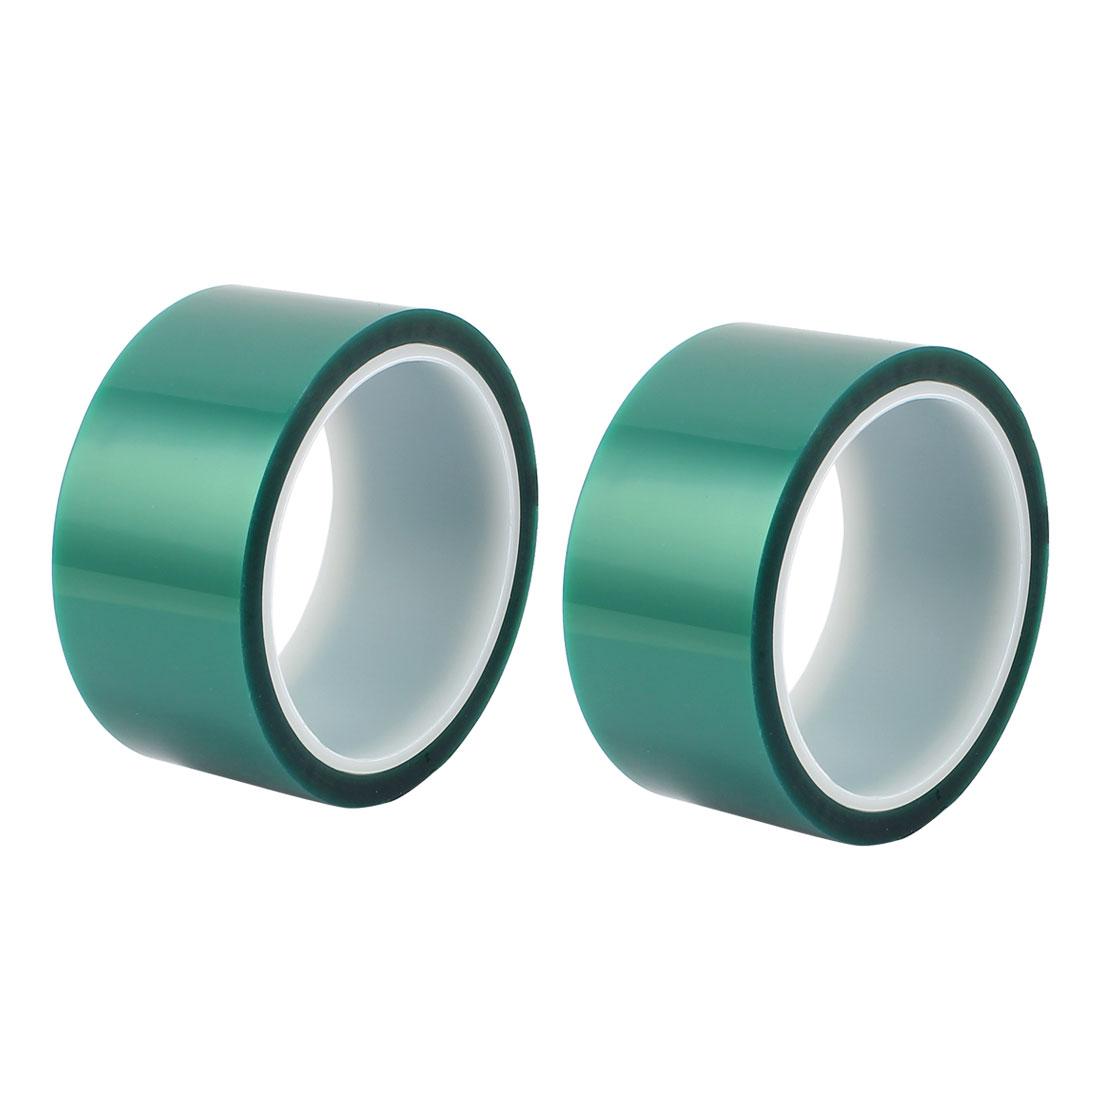 2pcs 45mm Width 33M Long Green PET High Temperature Heat Resistant PCB Solder Tape